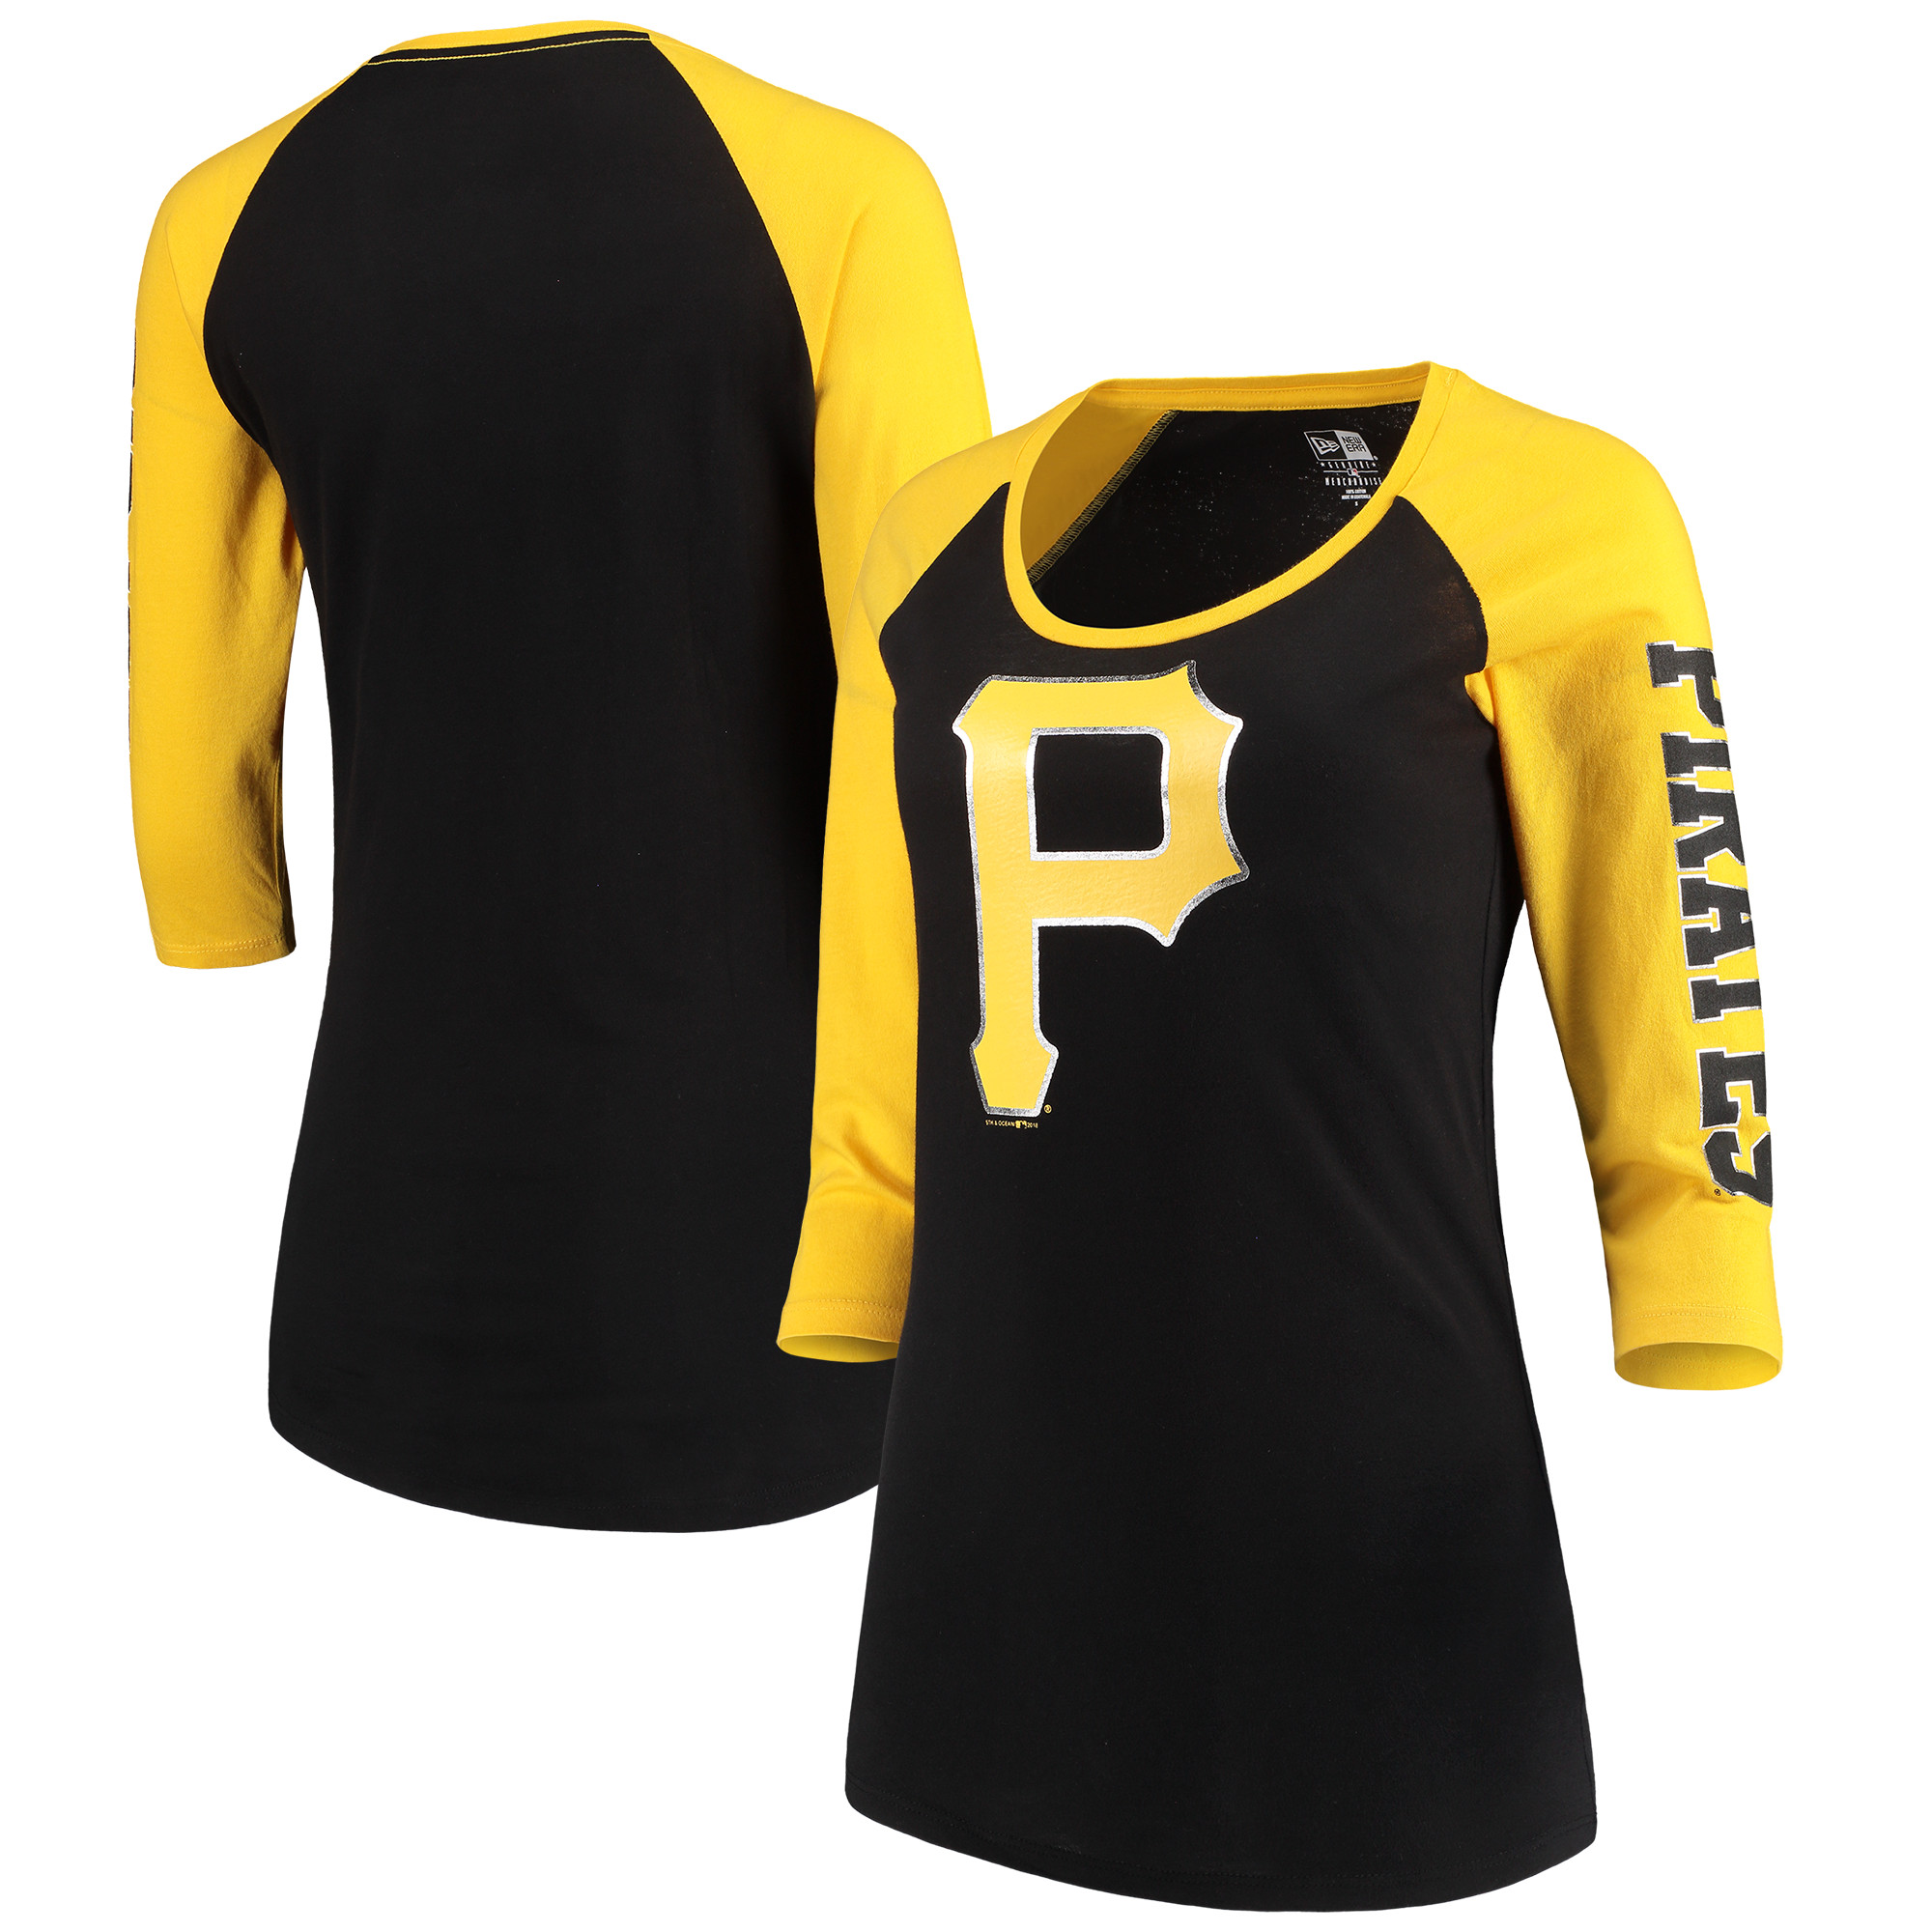 Pittsburgh Pirates 5th & Ocean by New Era Women's Foil 3/4-Sleeve T-Shirt - Black/Gold